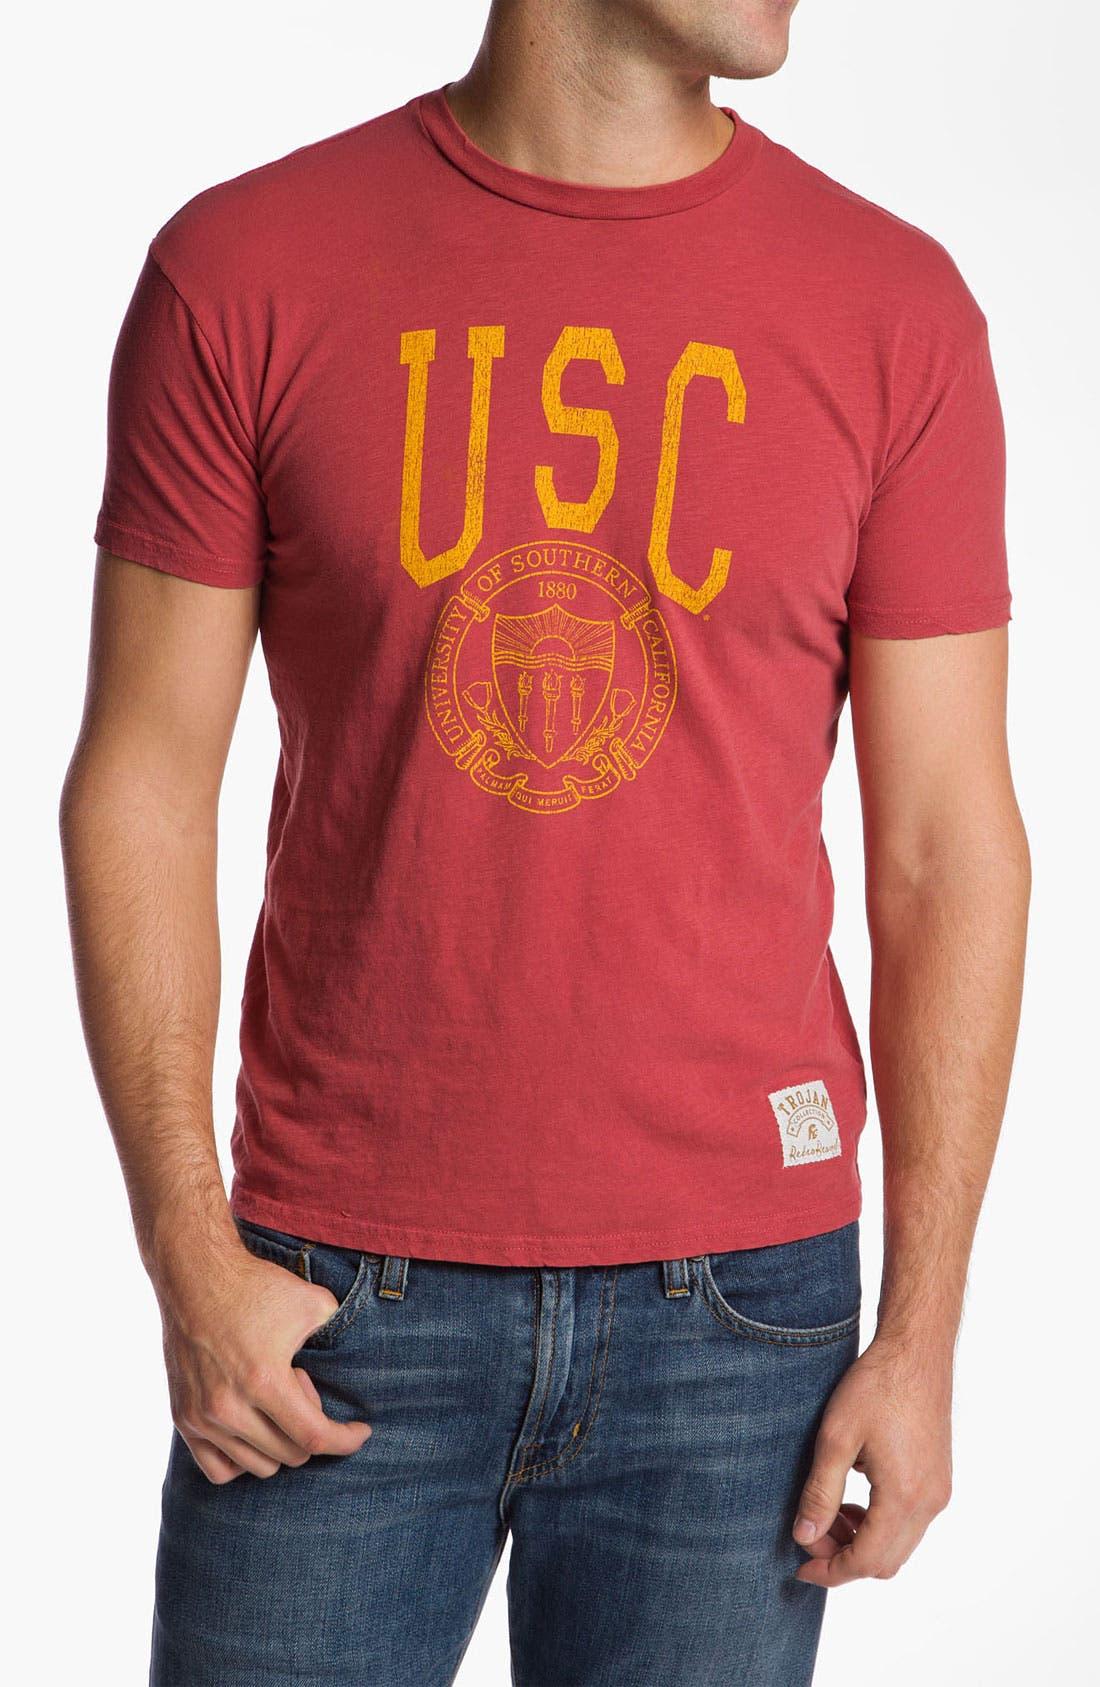 Alternate Image 1 Selected - The Original Retro Brand 'USC' T-Shirt